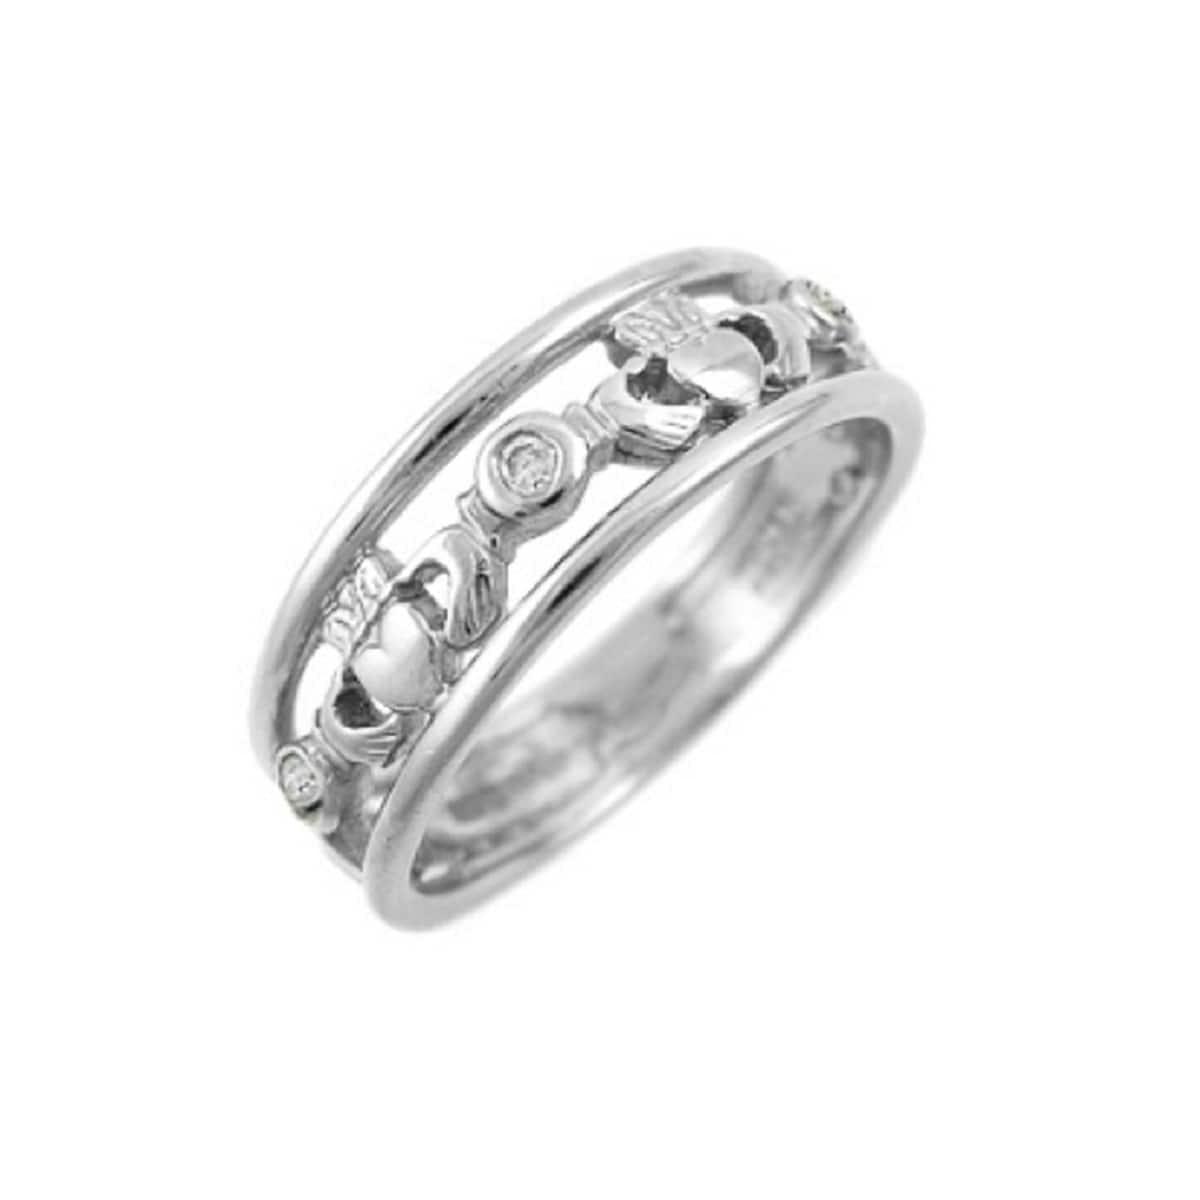 14k White Gold 3 Stone Diamond Claddagh Ring